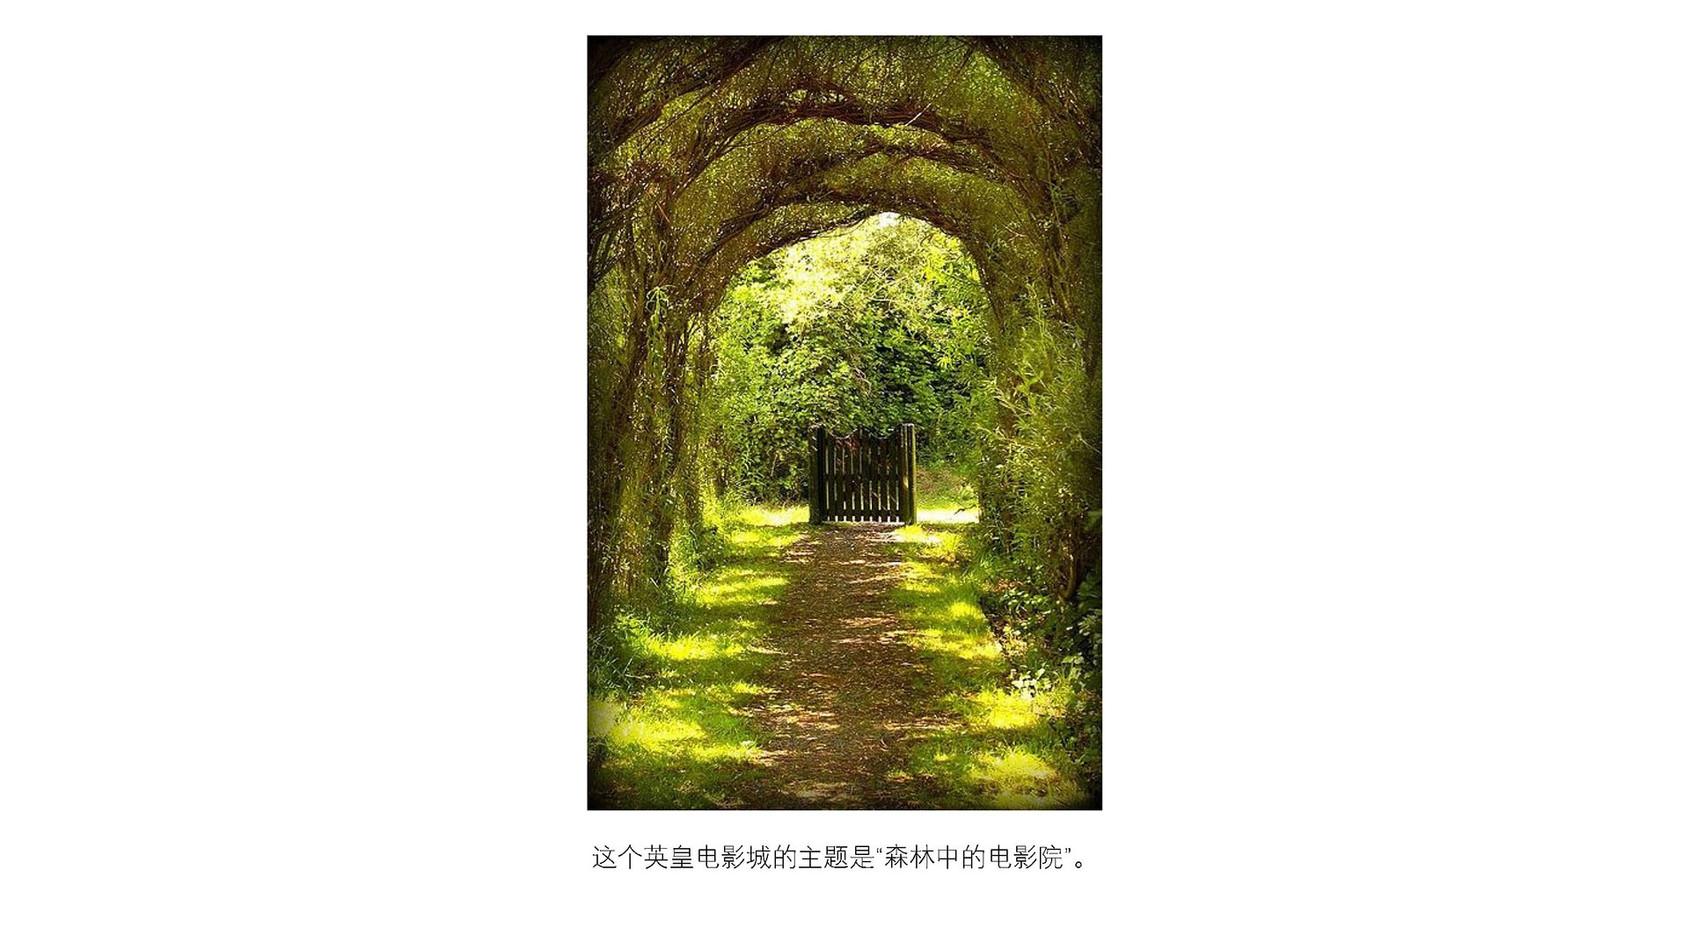 CHONGQING-EMPEROR-CINEMA-ZH 01.jpg